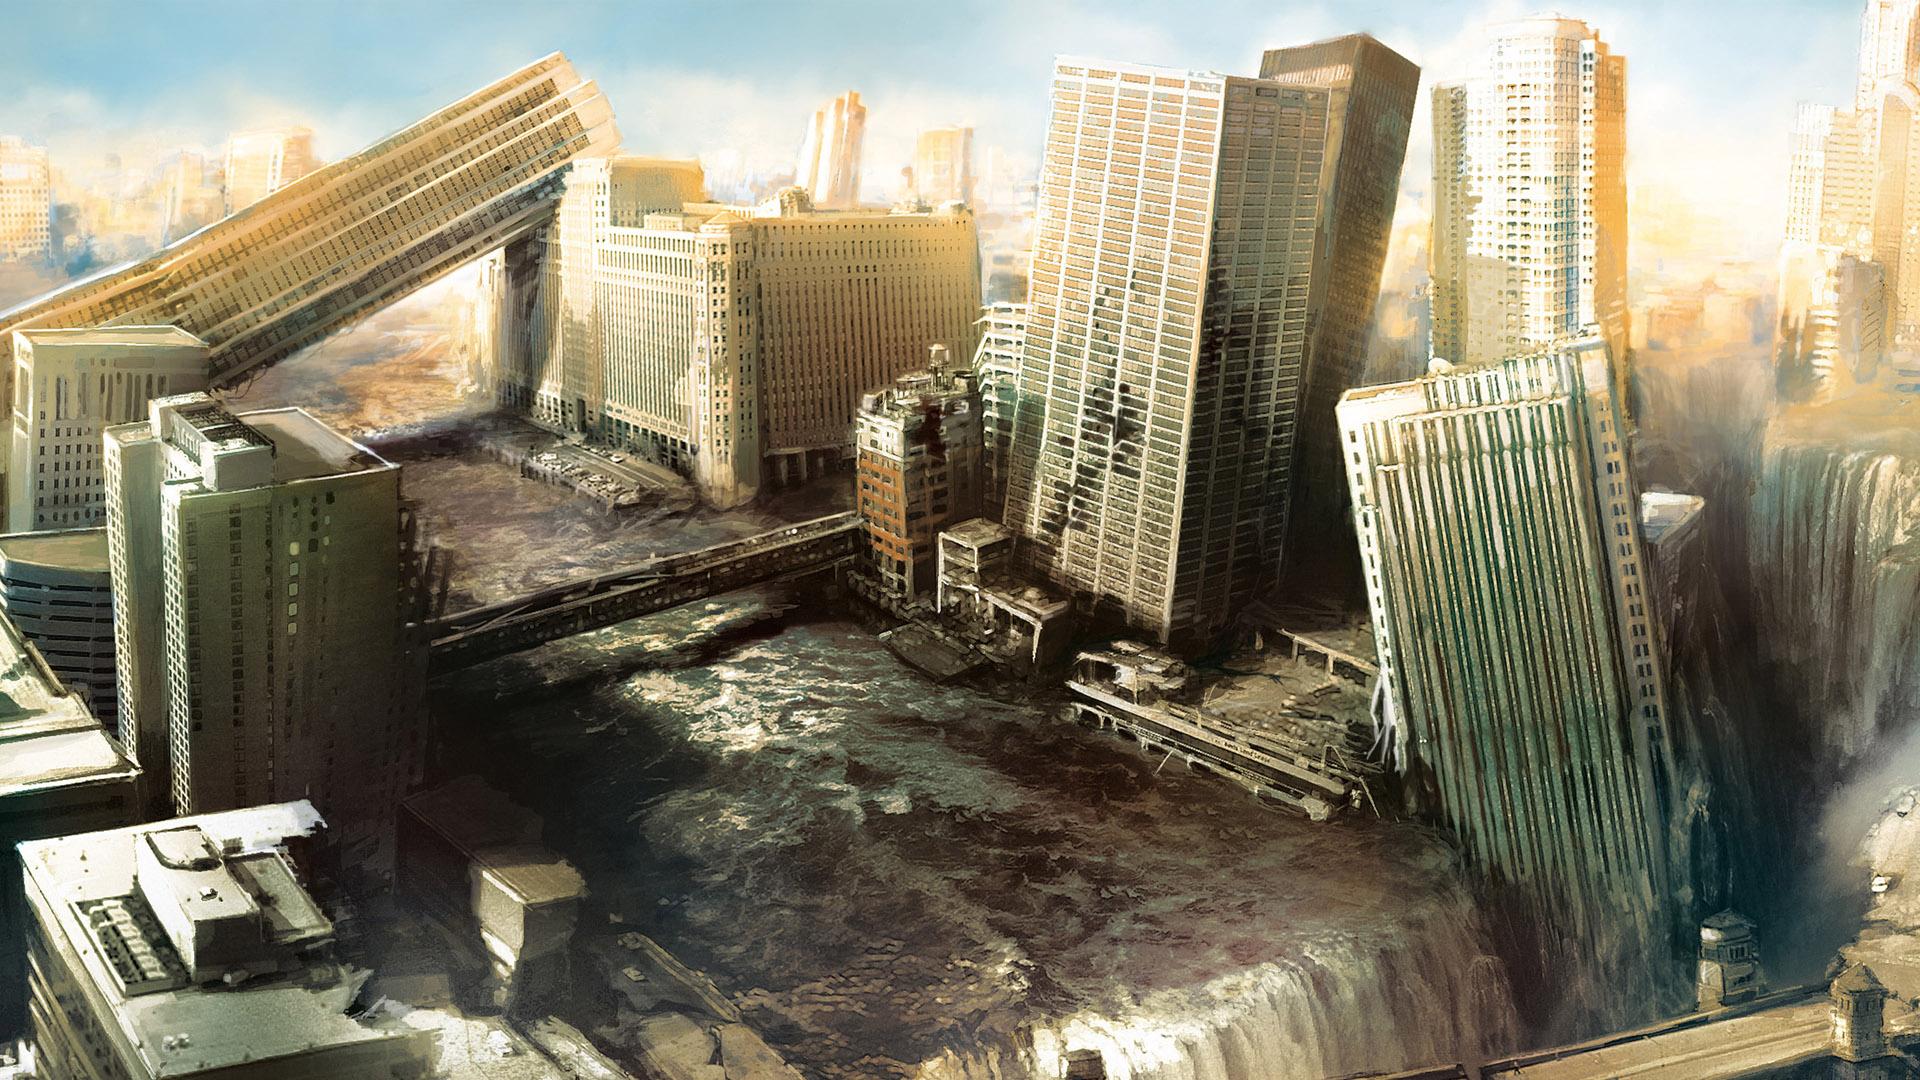 Post Apocalyptic City Myconfinedspace